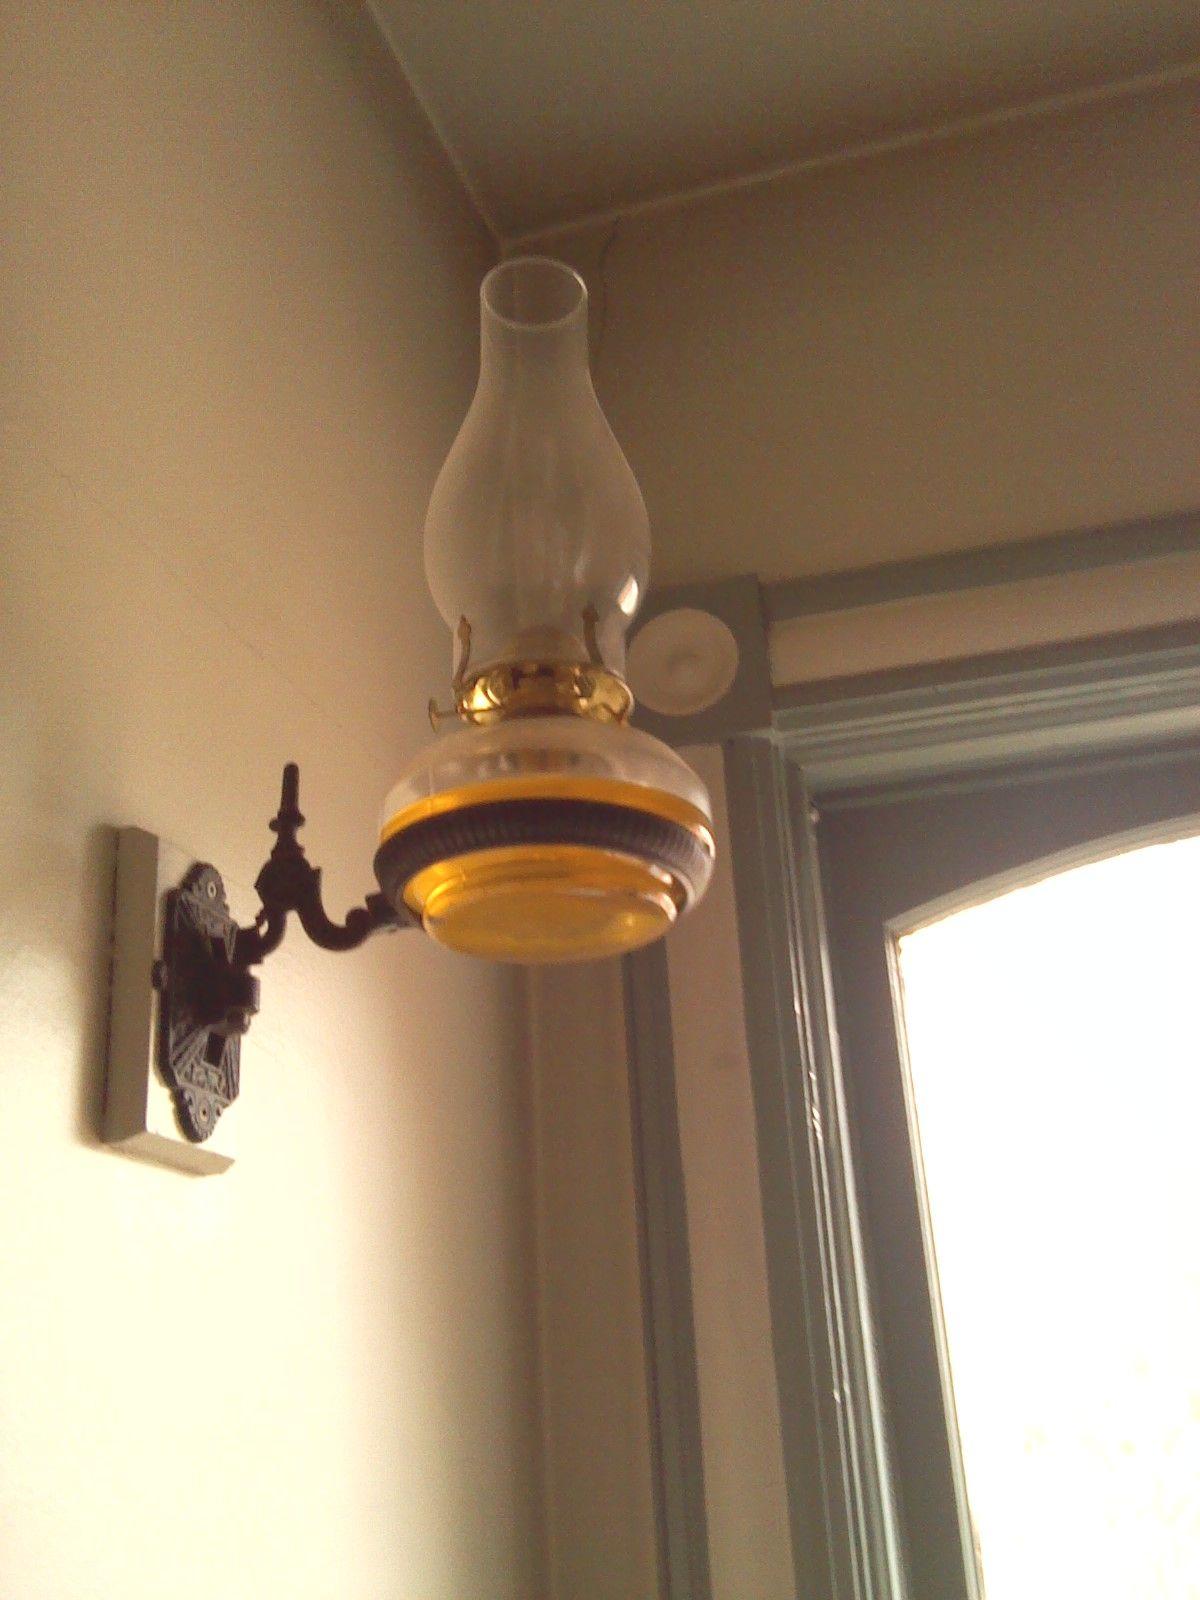 Wall Mounted Oil Lamp At Bronte Creek Lamp Vintage Lamps Oil Lamps